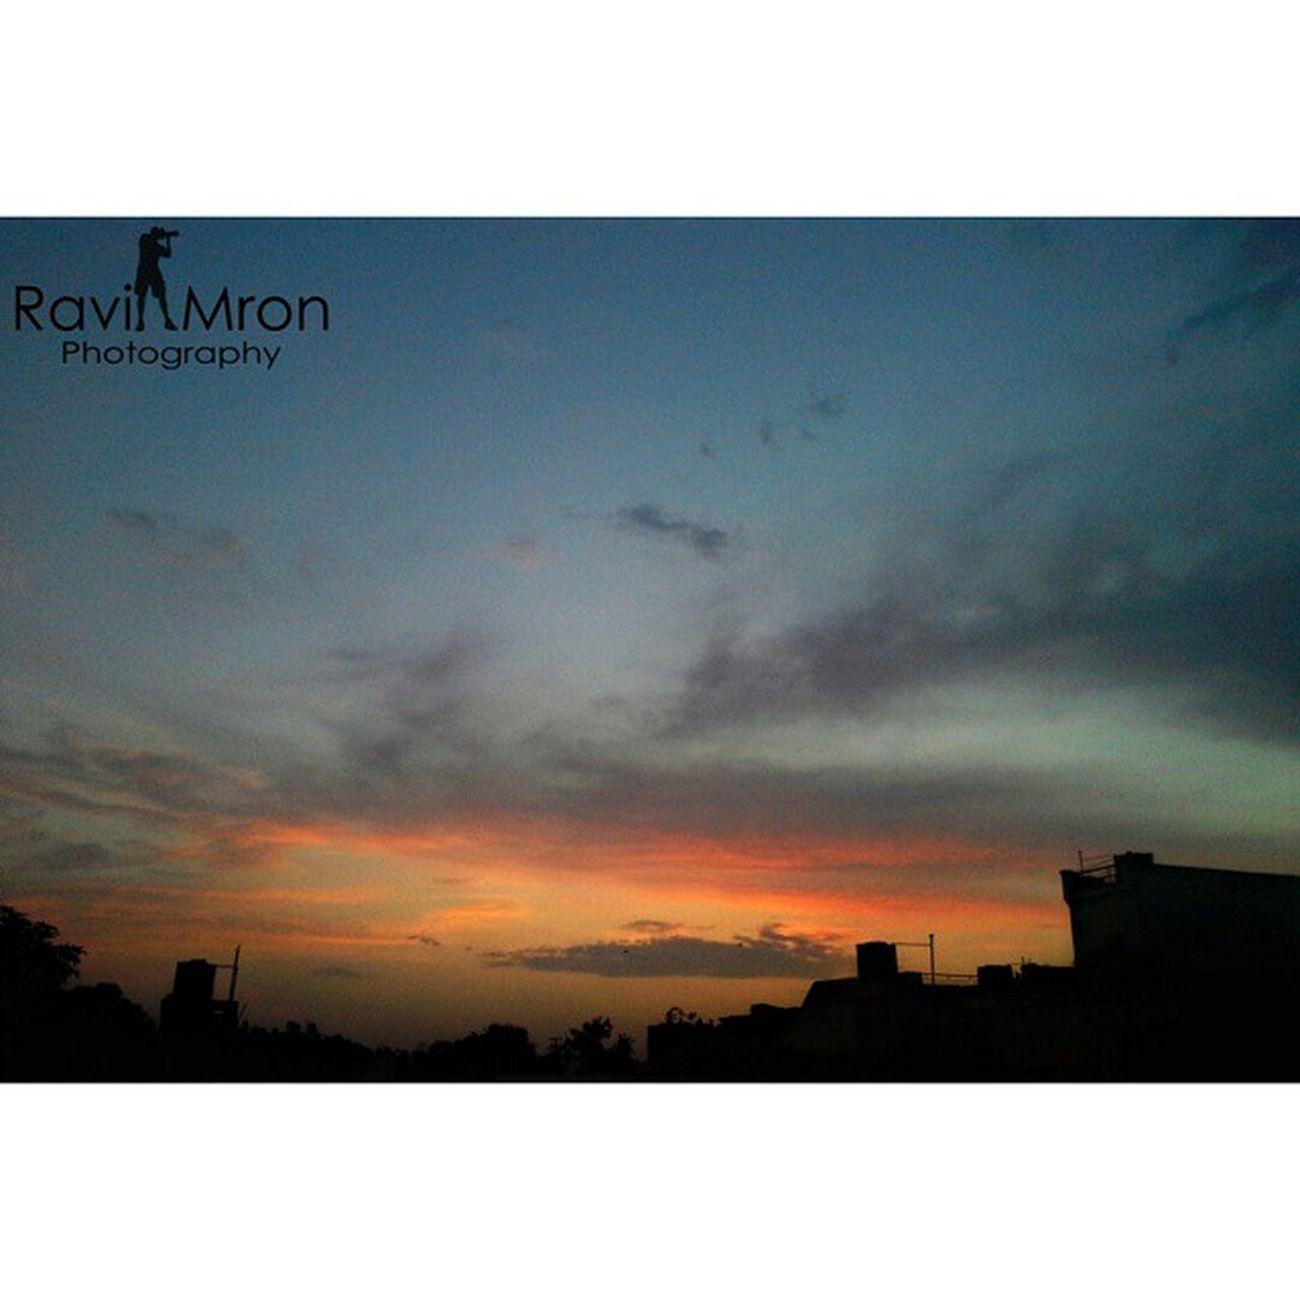 RaviMron_Photography Sunset Evening_shot Picsart_made_it_awesome